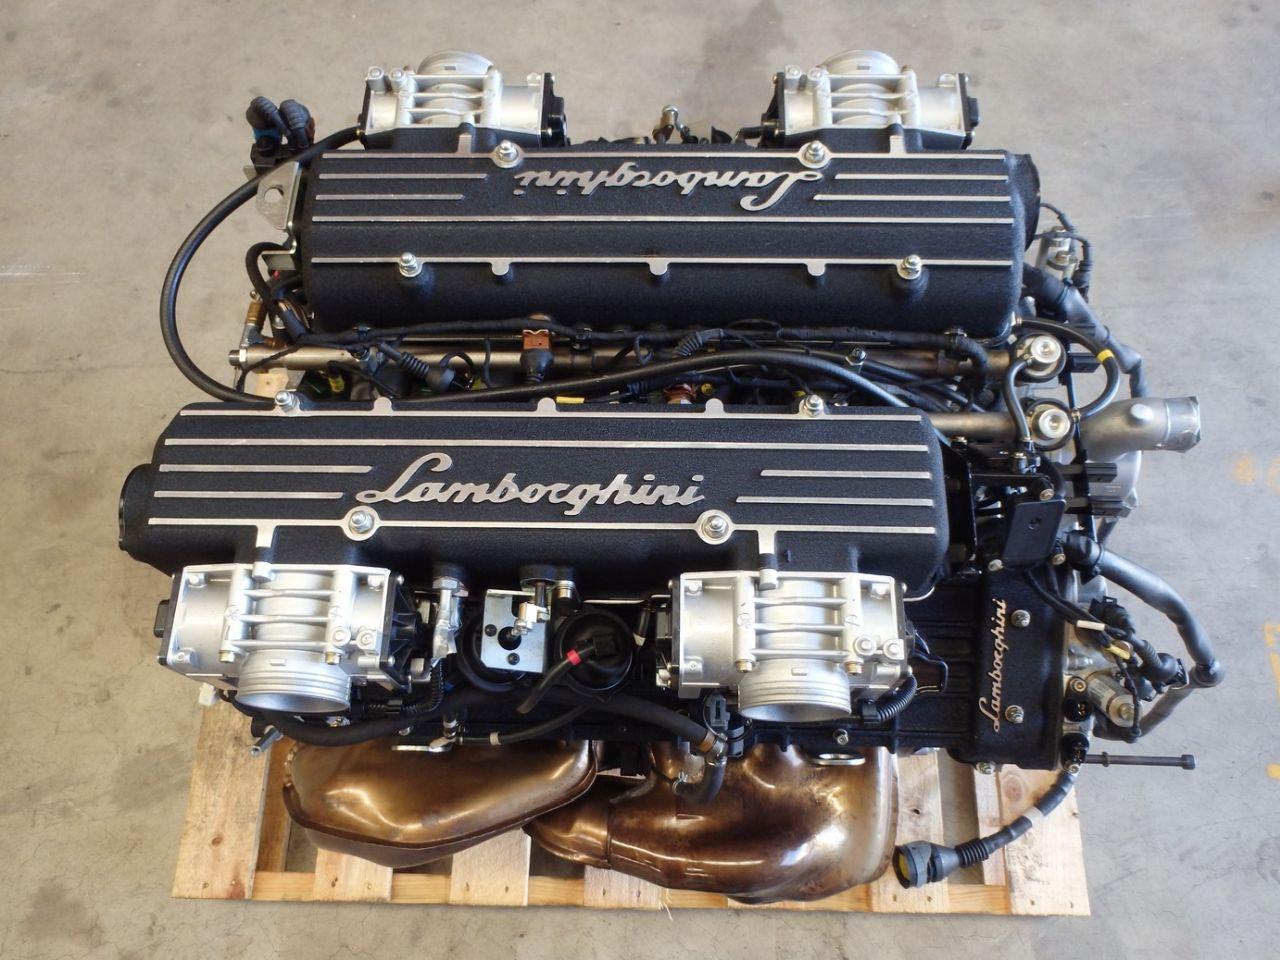 Lamborghini-Murcielago-V12-Engine-For-Sale-1